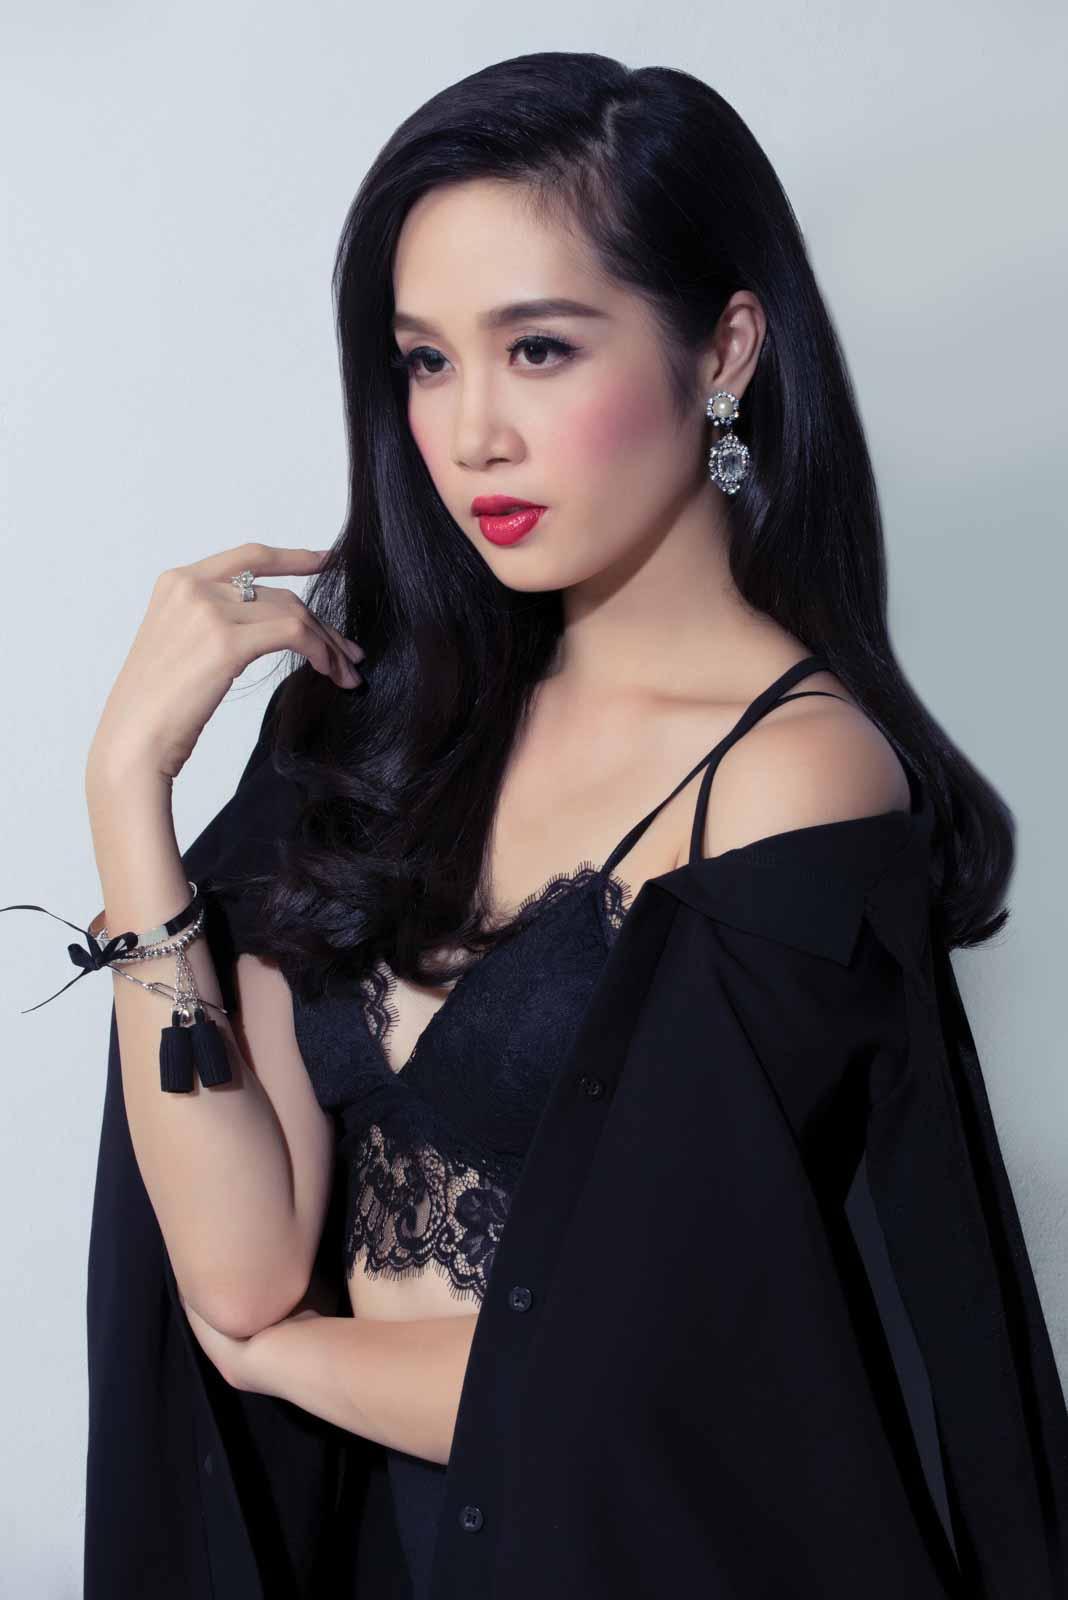 xu-huong-vay-dai-cho-quy-co-thanh-thi-TT-655-2016-2